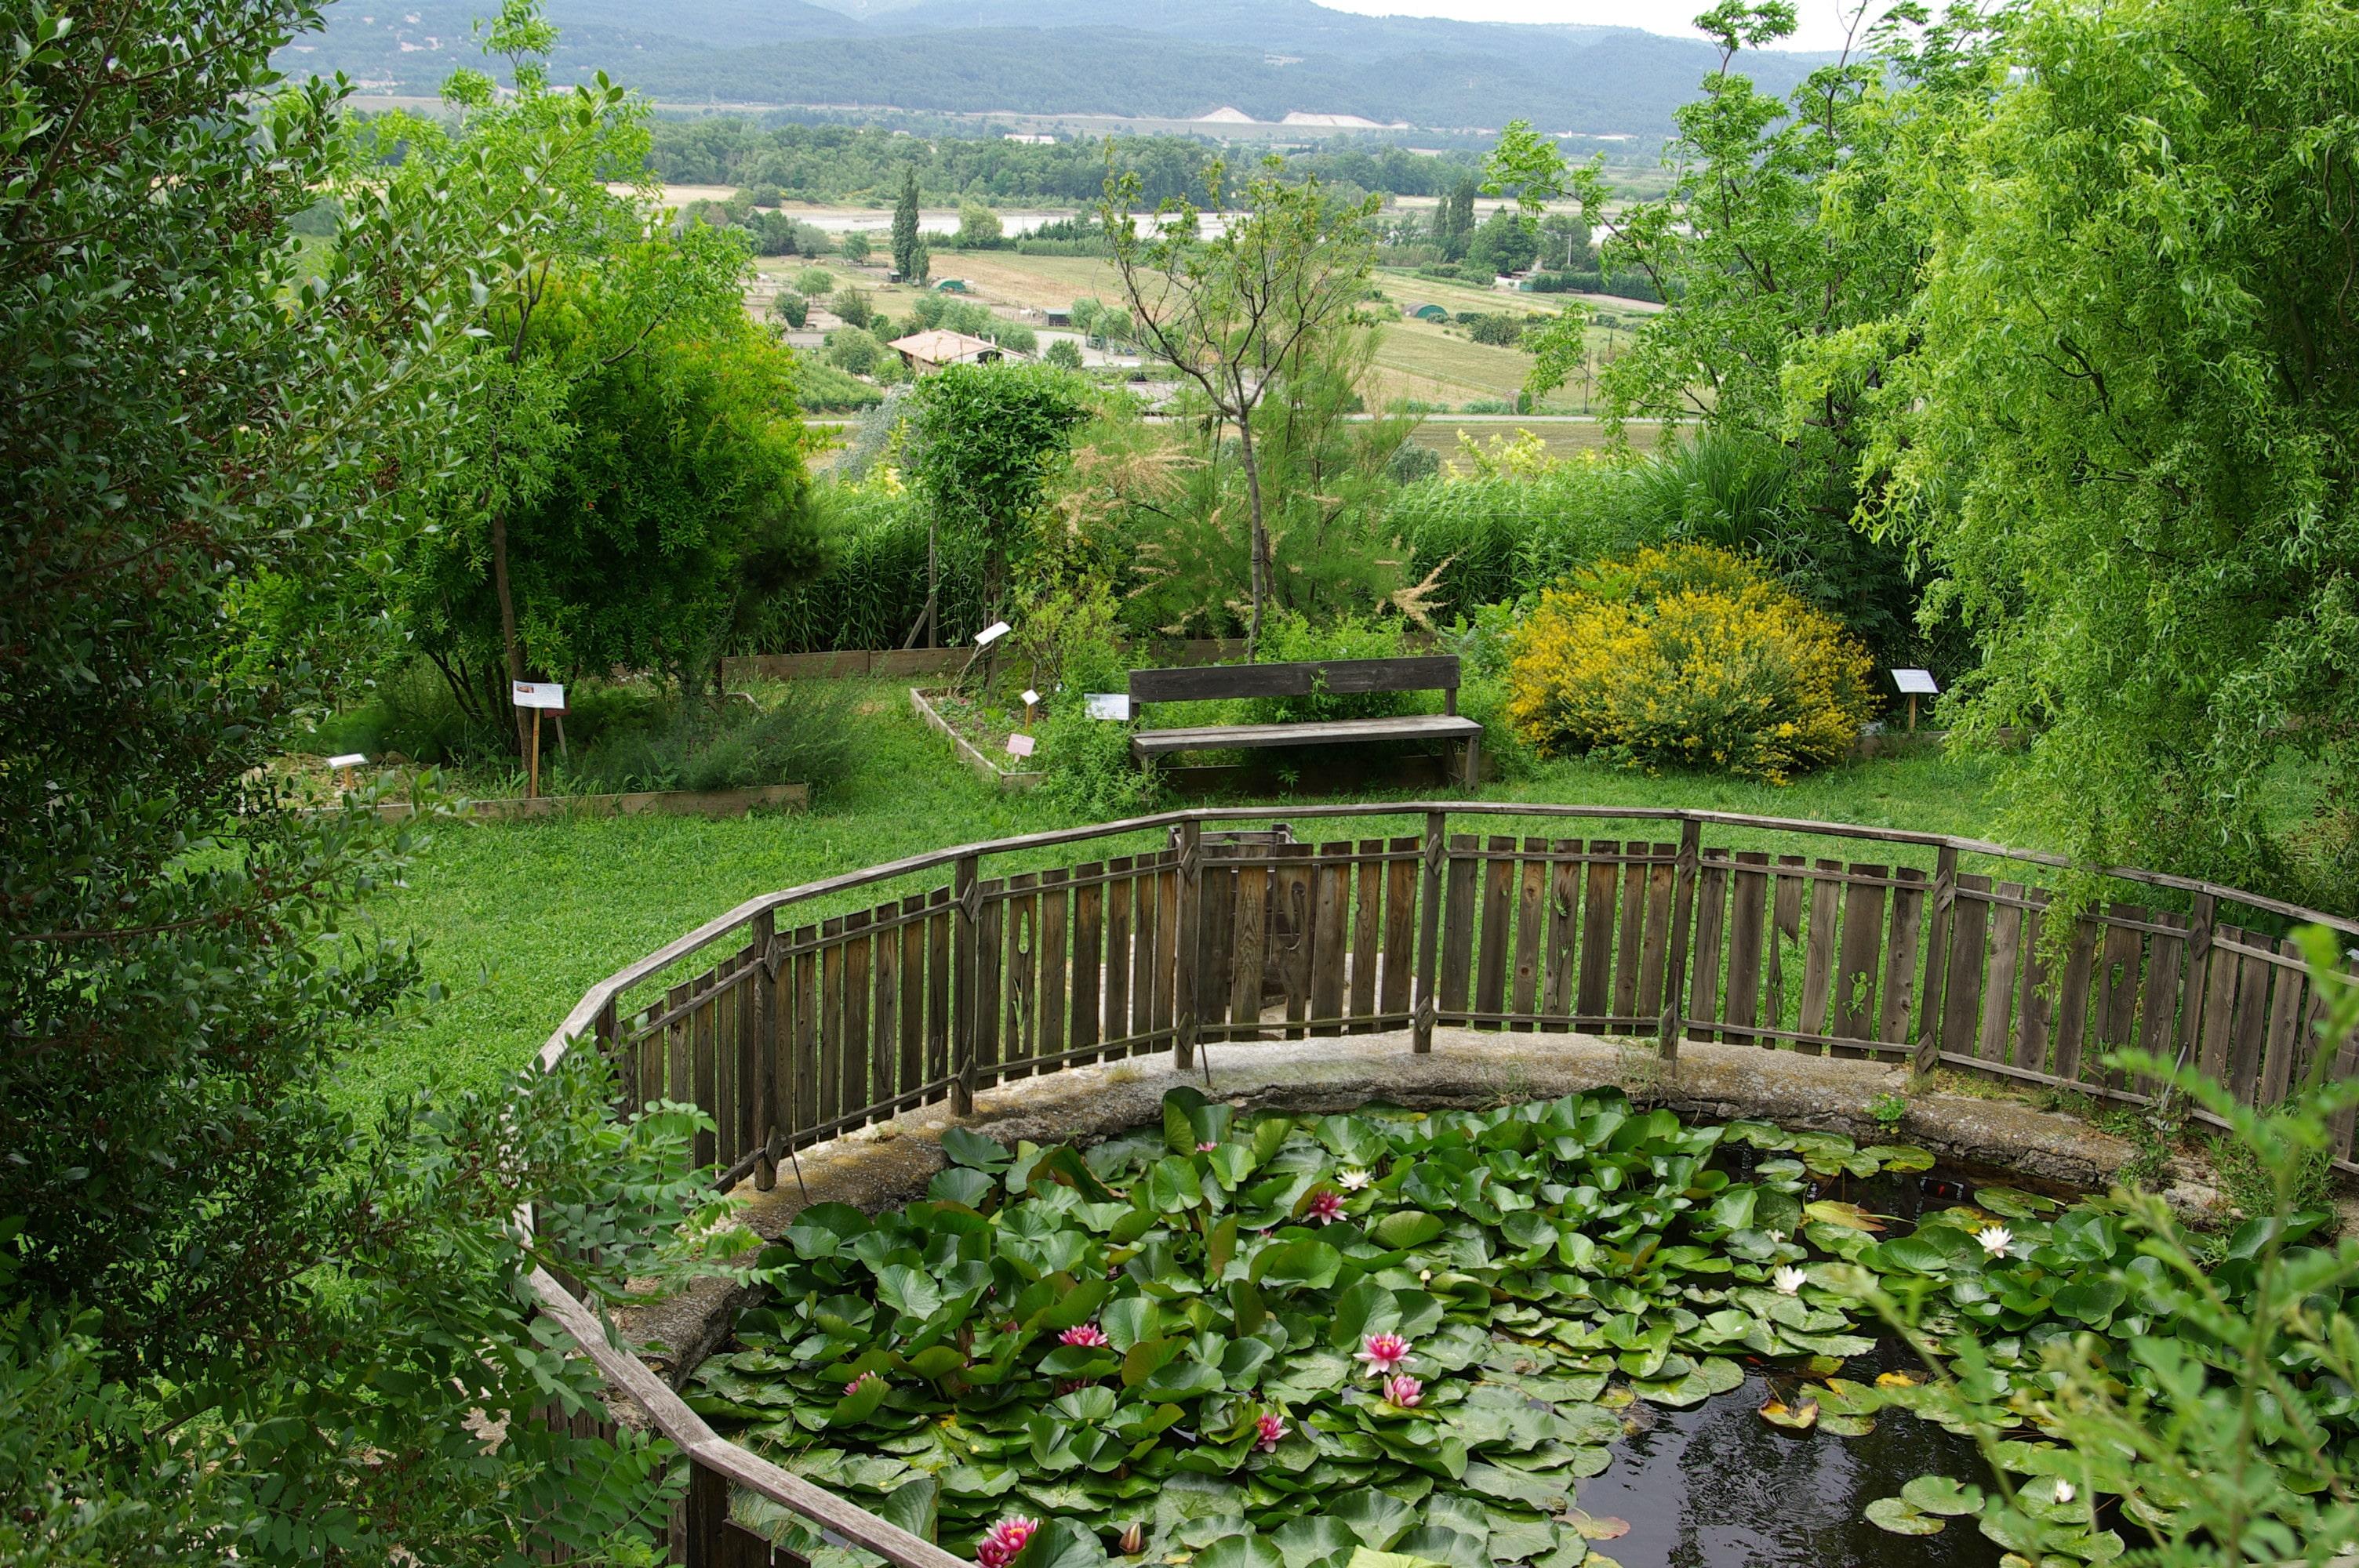 Bassin rond parcs et jardins paca for Bassin de jardin algues vertes